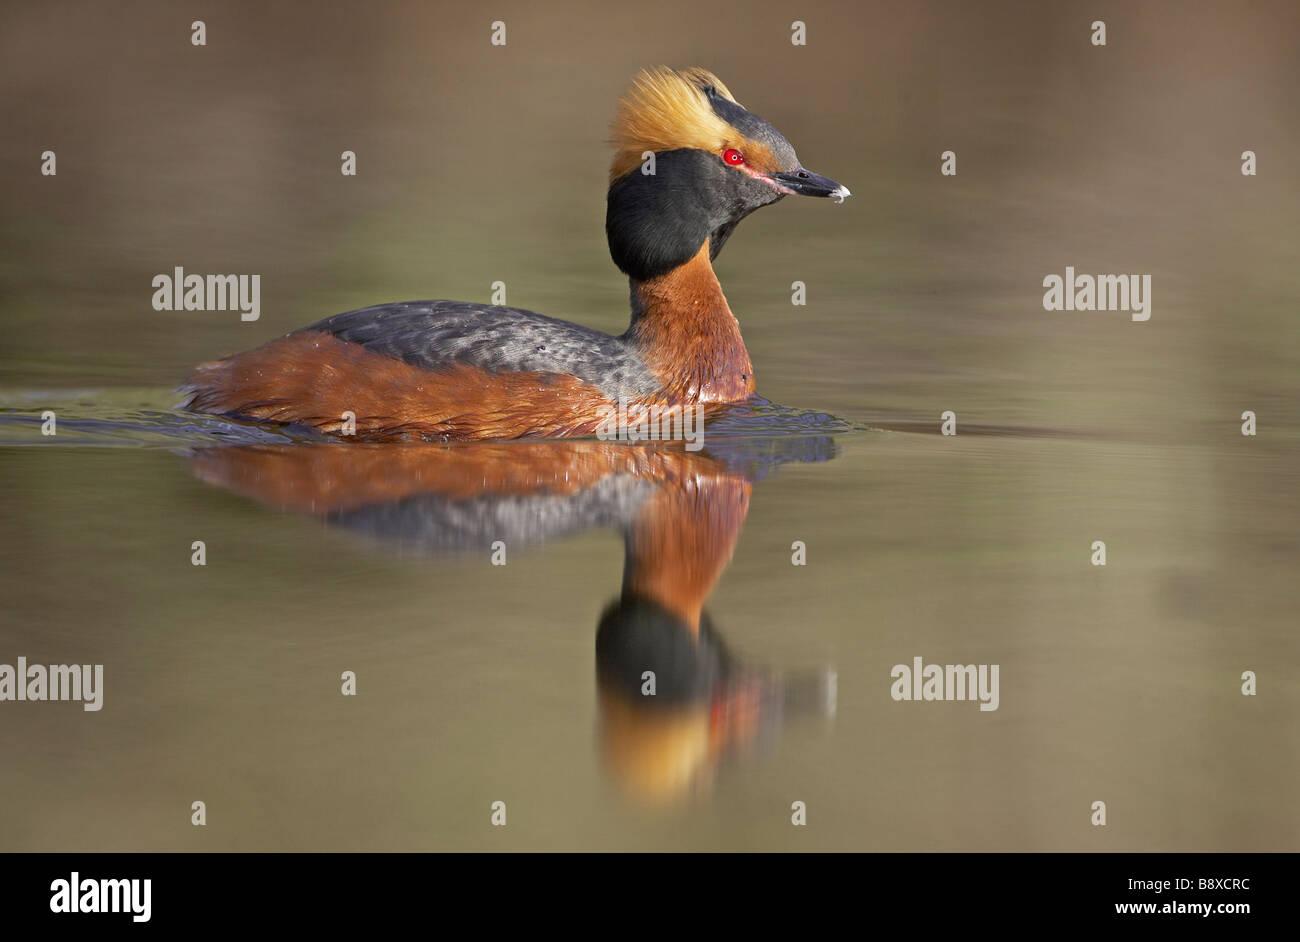 Slavonian Grebe (Podiceps auritus) on water - Stock Image